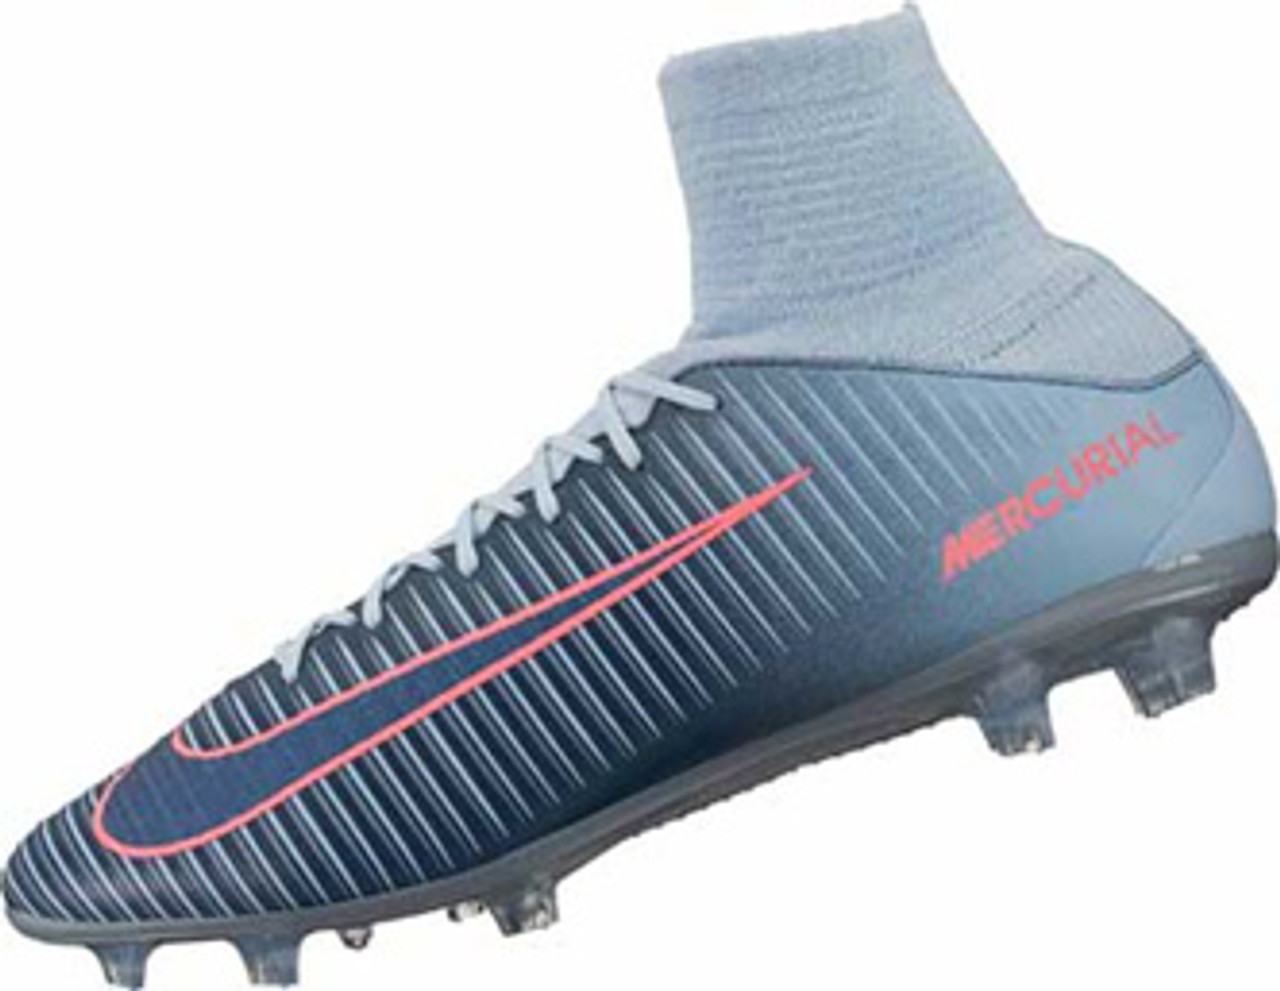 Nike Mercurial Veloce III DF FG Soccer Cleats Laser Orange